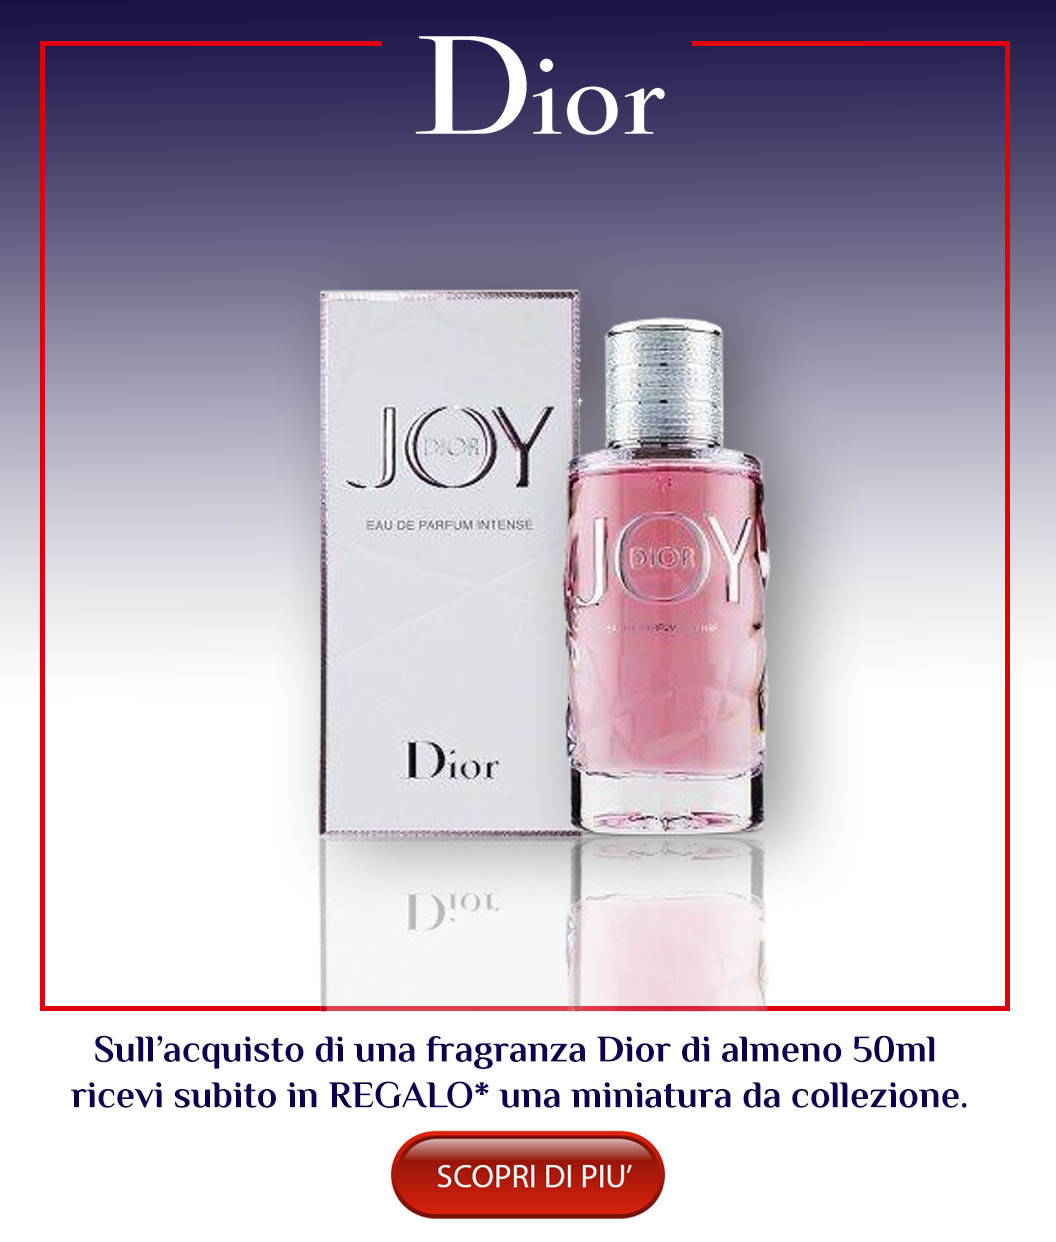 dior5.jpg